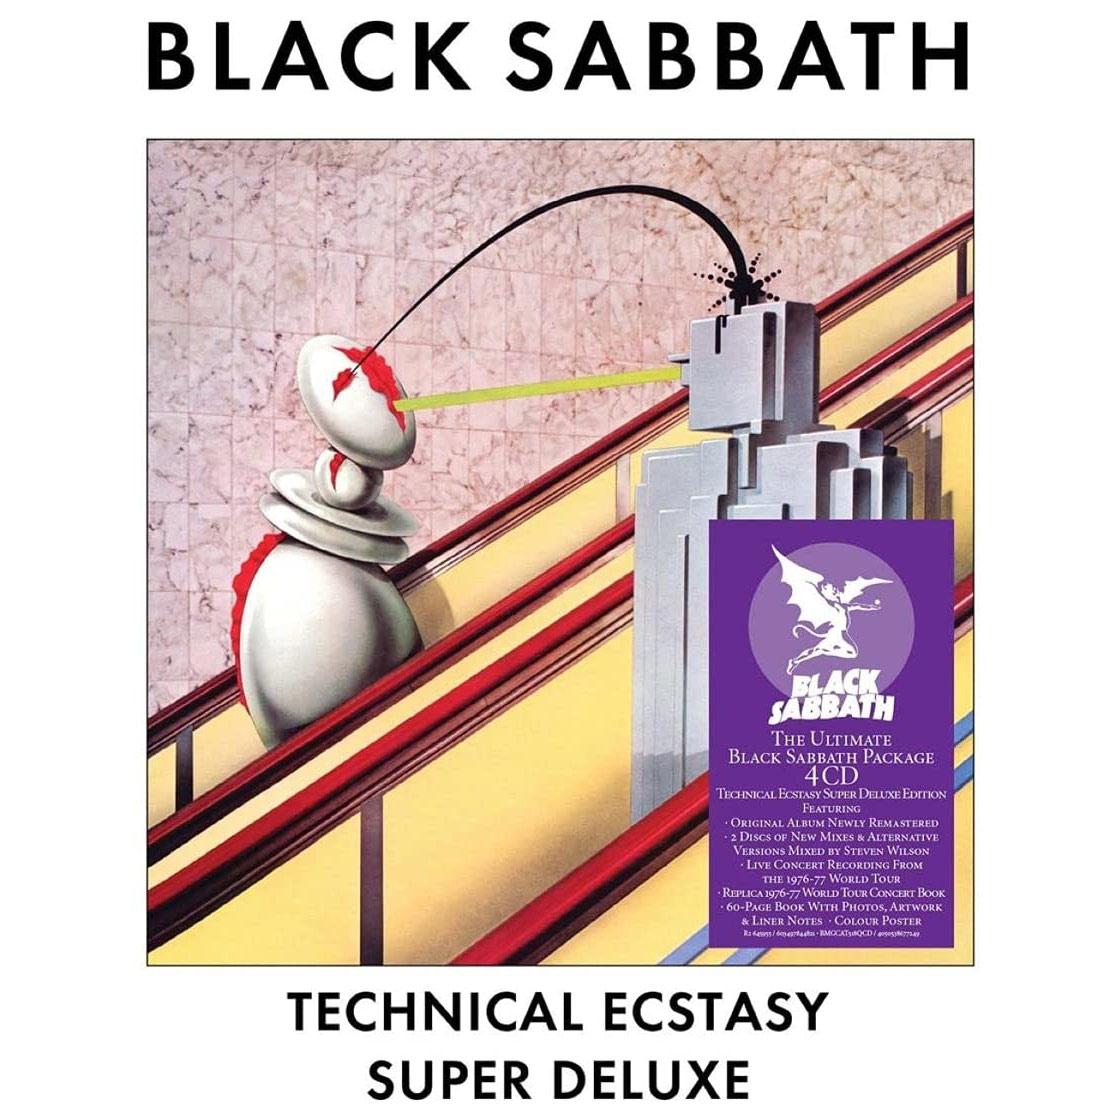 Black Sabbath / Technical Ecstasy super deluxe